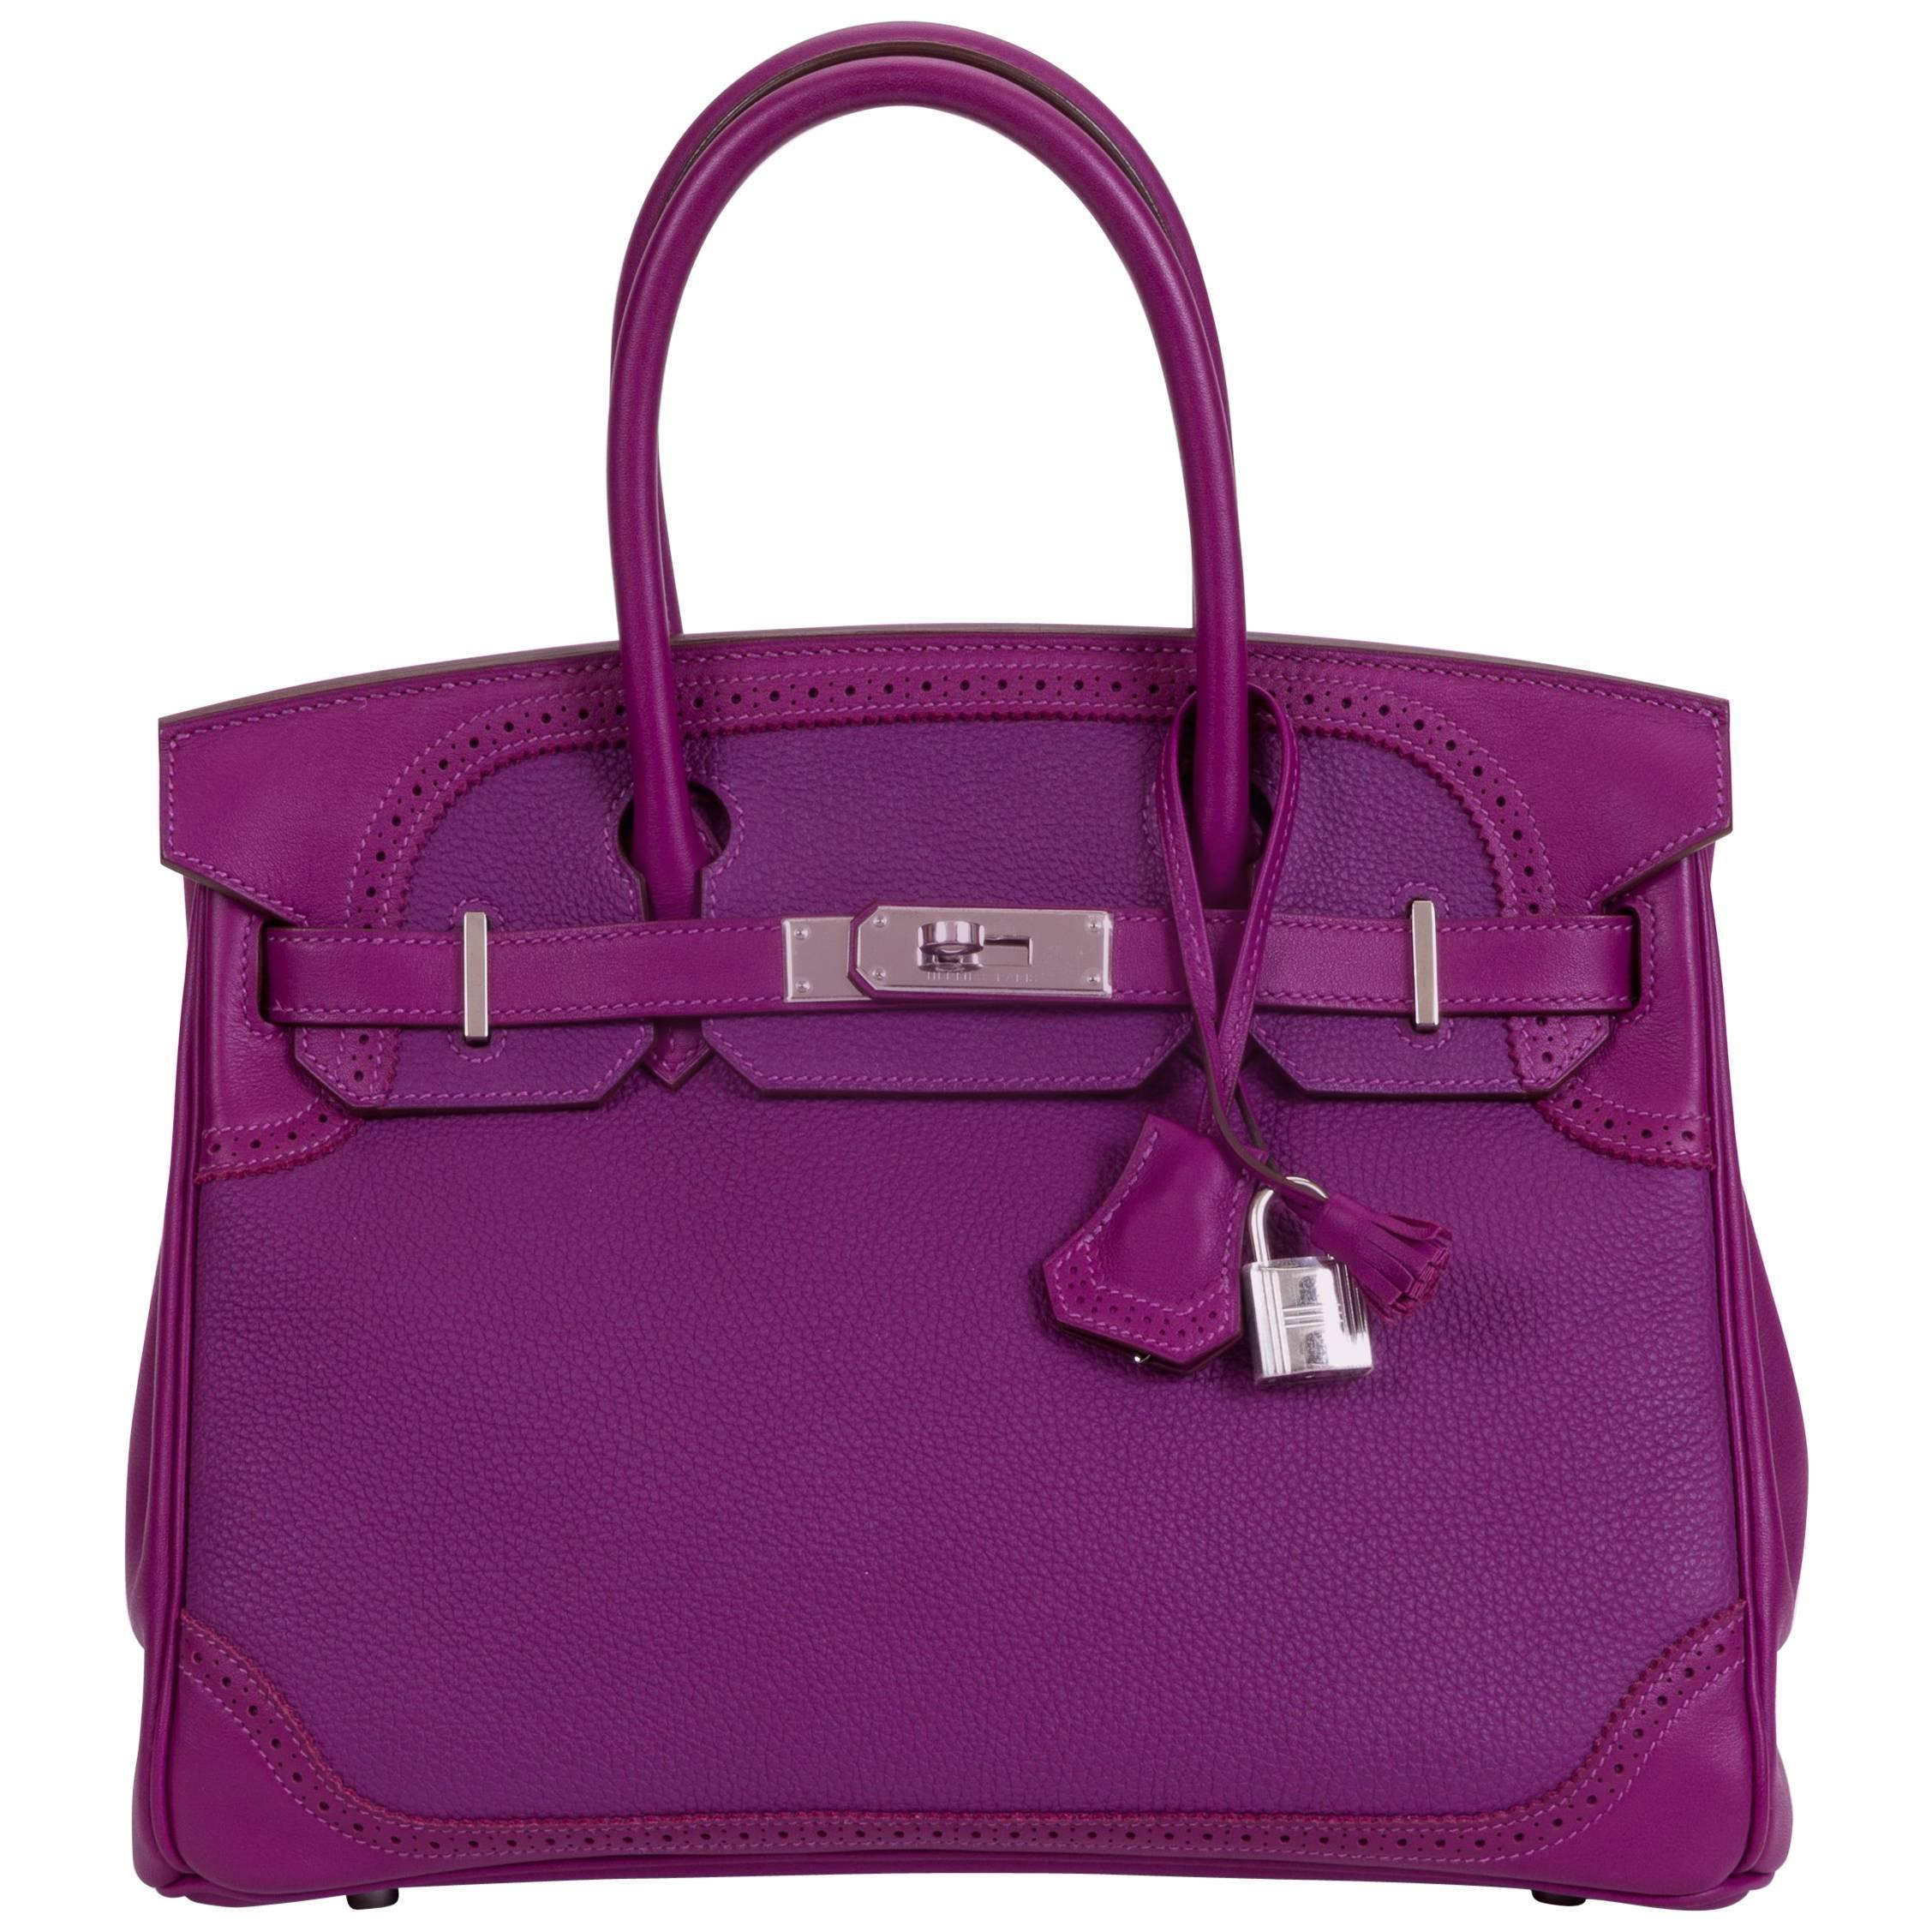 94e0575900a5 Vintage Lux Handbags and Purses - 1stdibs - Page 4